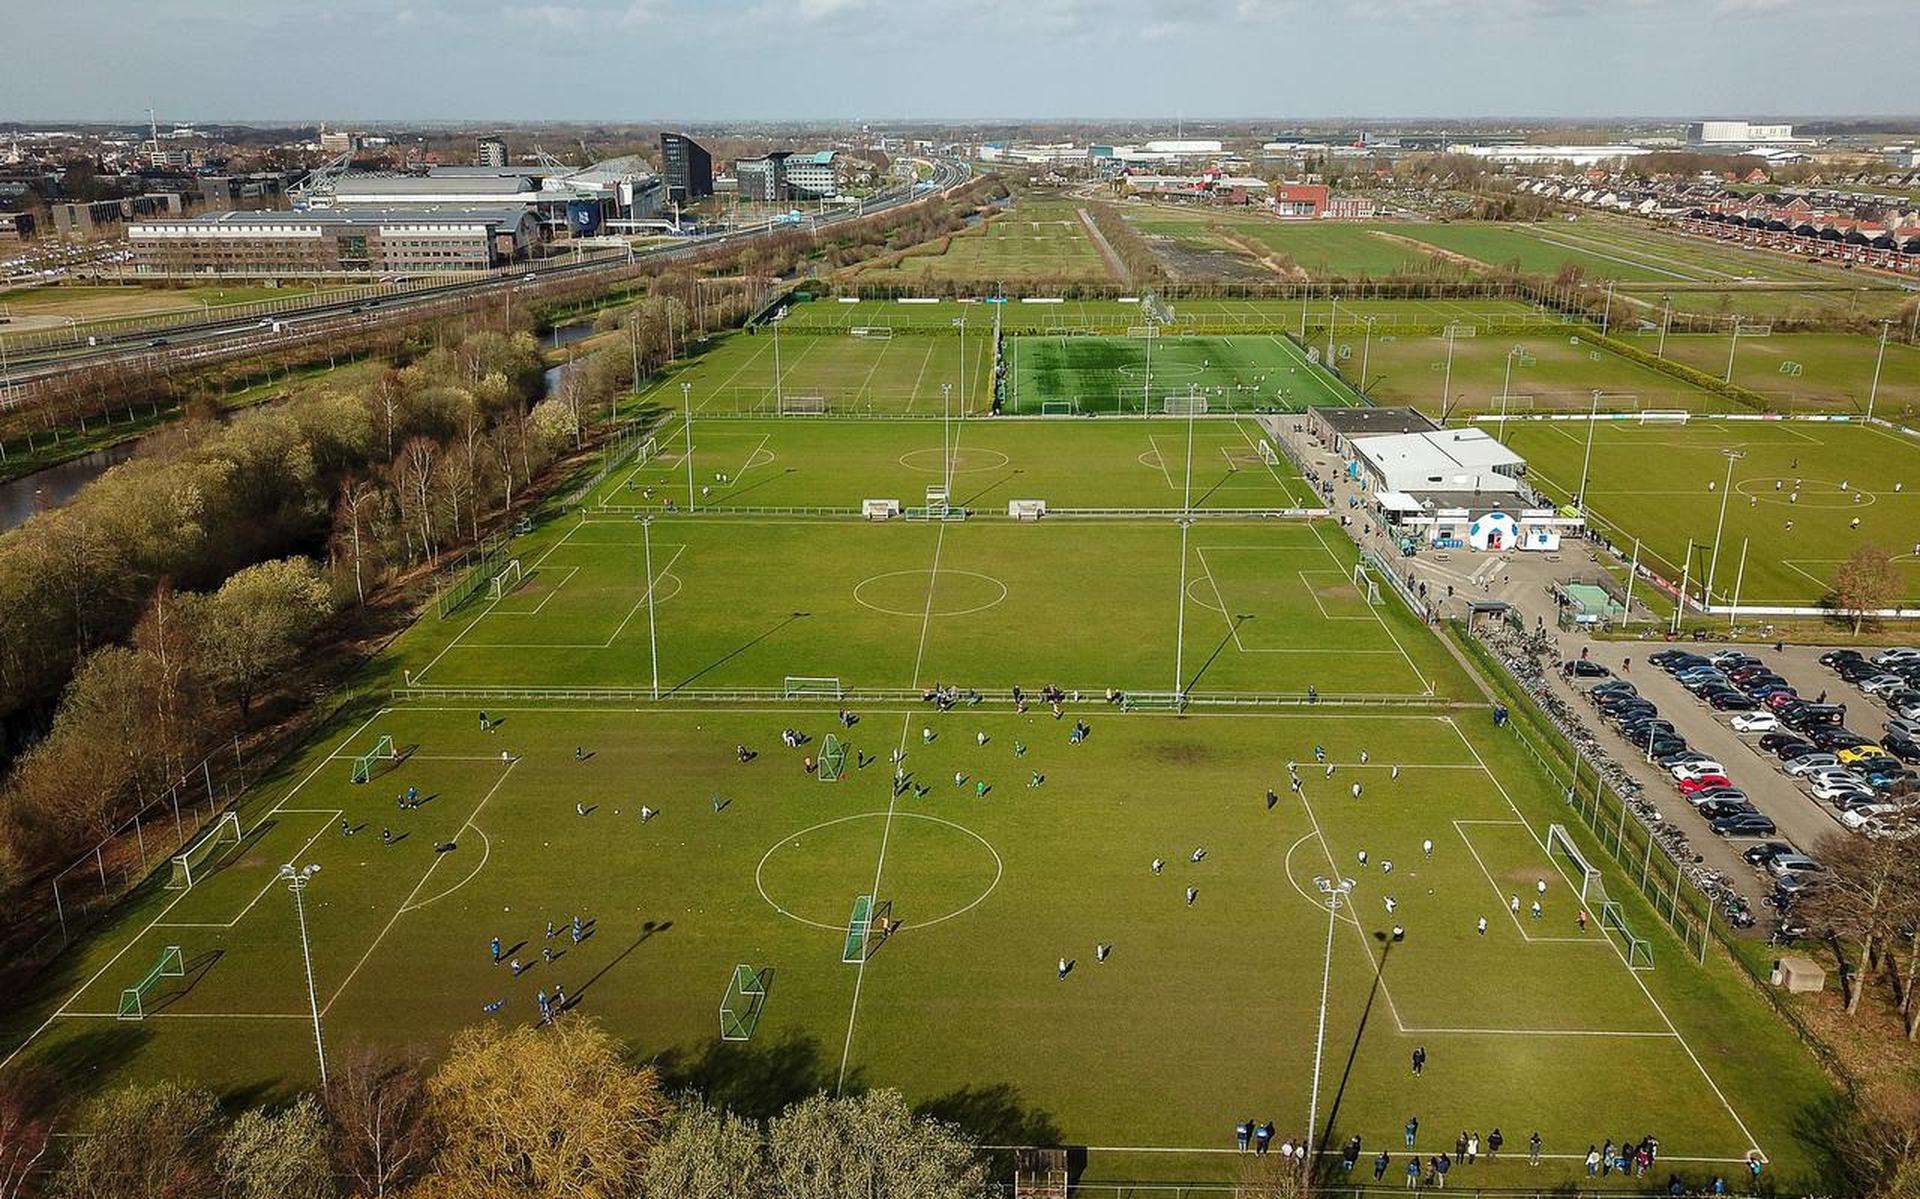 SC Cambuur wins reserve derby at Skoatterwâld sports activities park 0-4 from SC Heerenveen